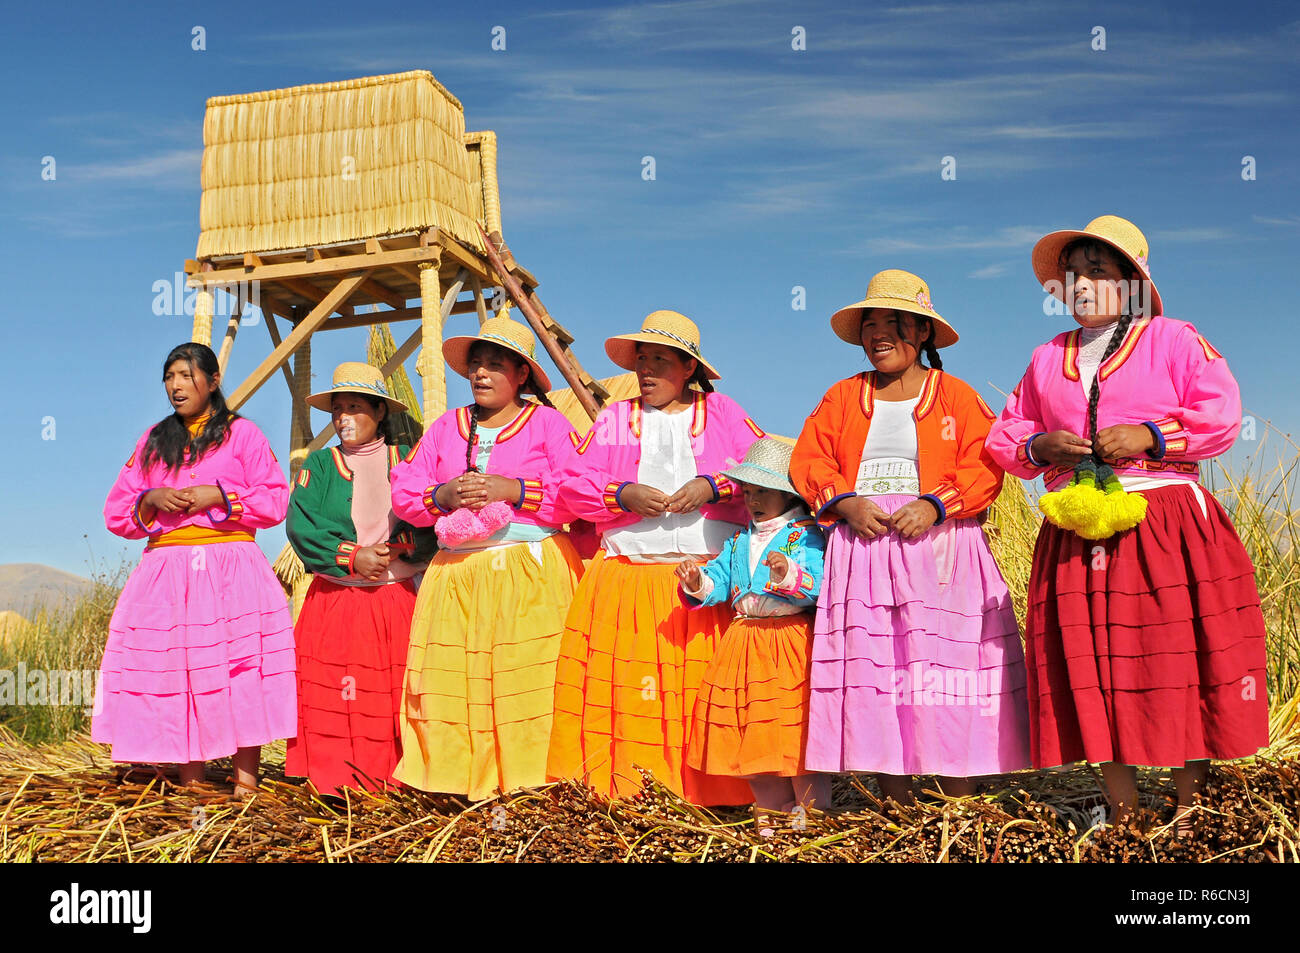 Uros Indian On Floating Island Titicaca Lake, Peru, South America Stock Photo